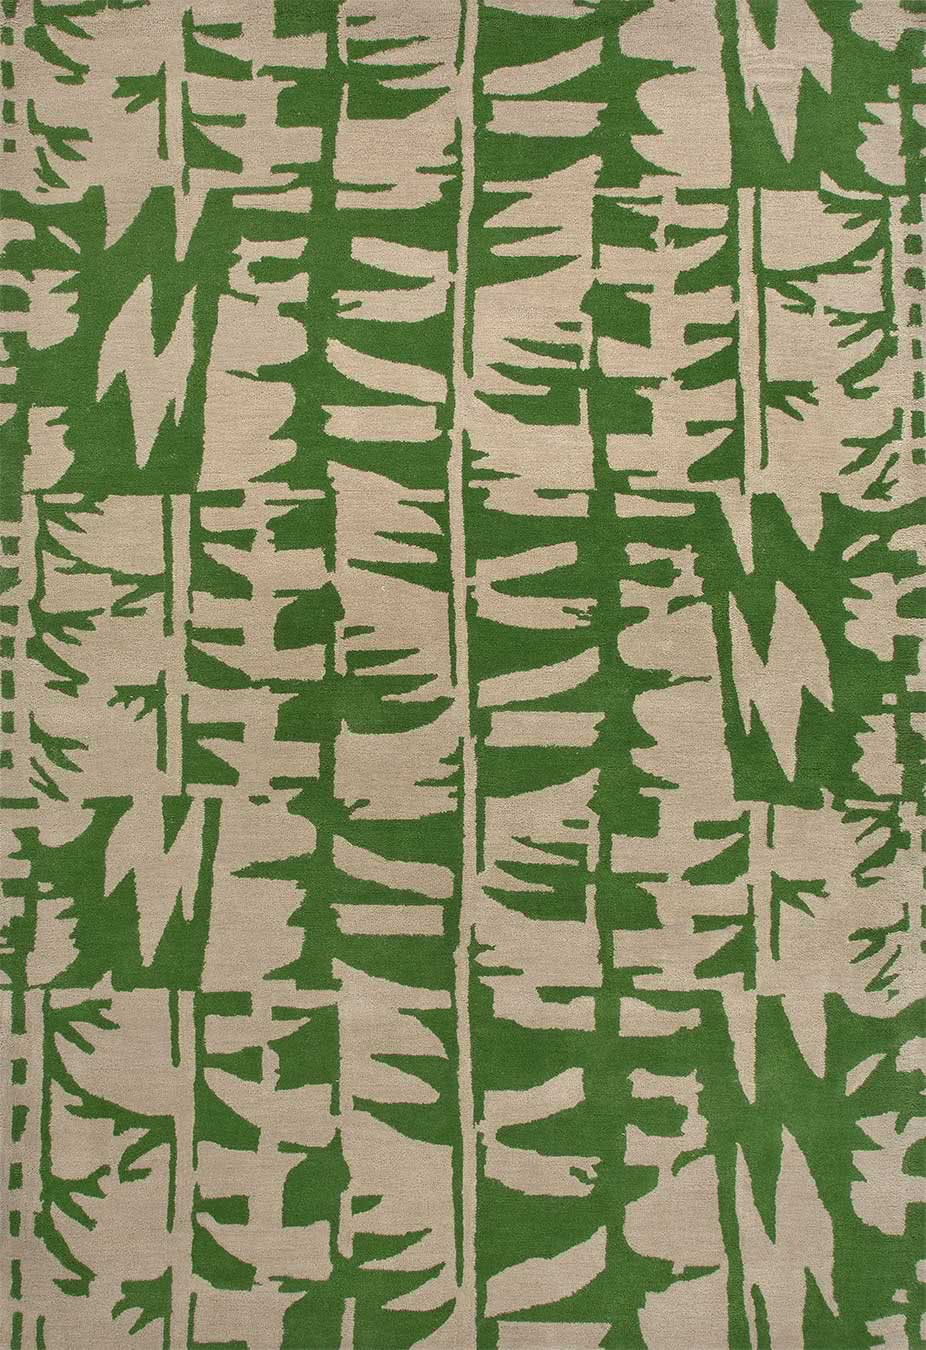 Tribal dance rug in green colourway overhead image